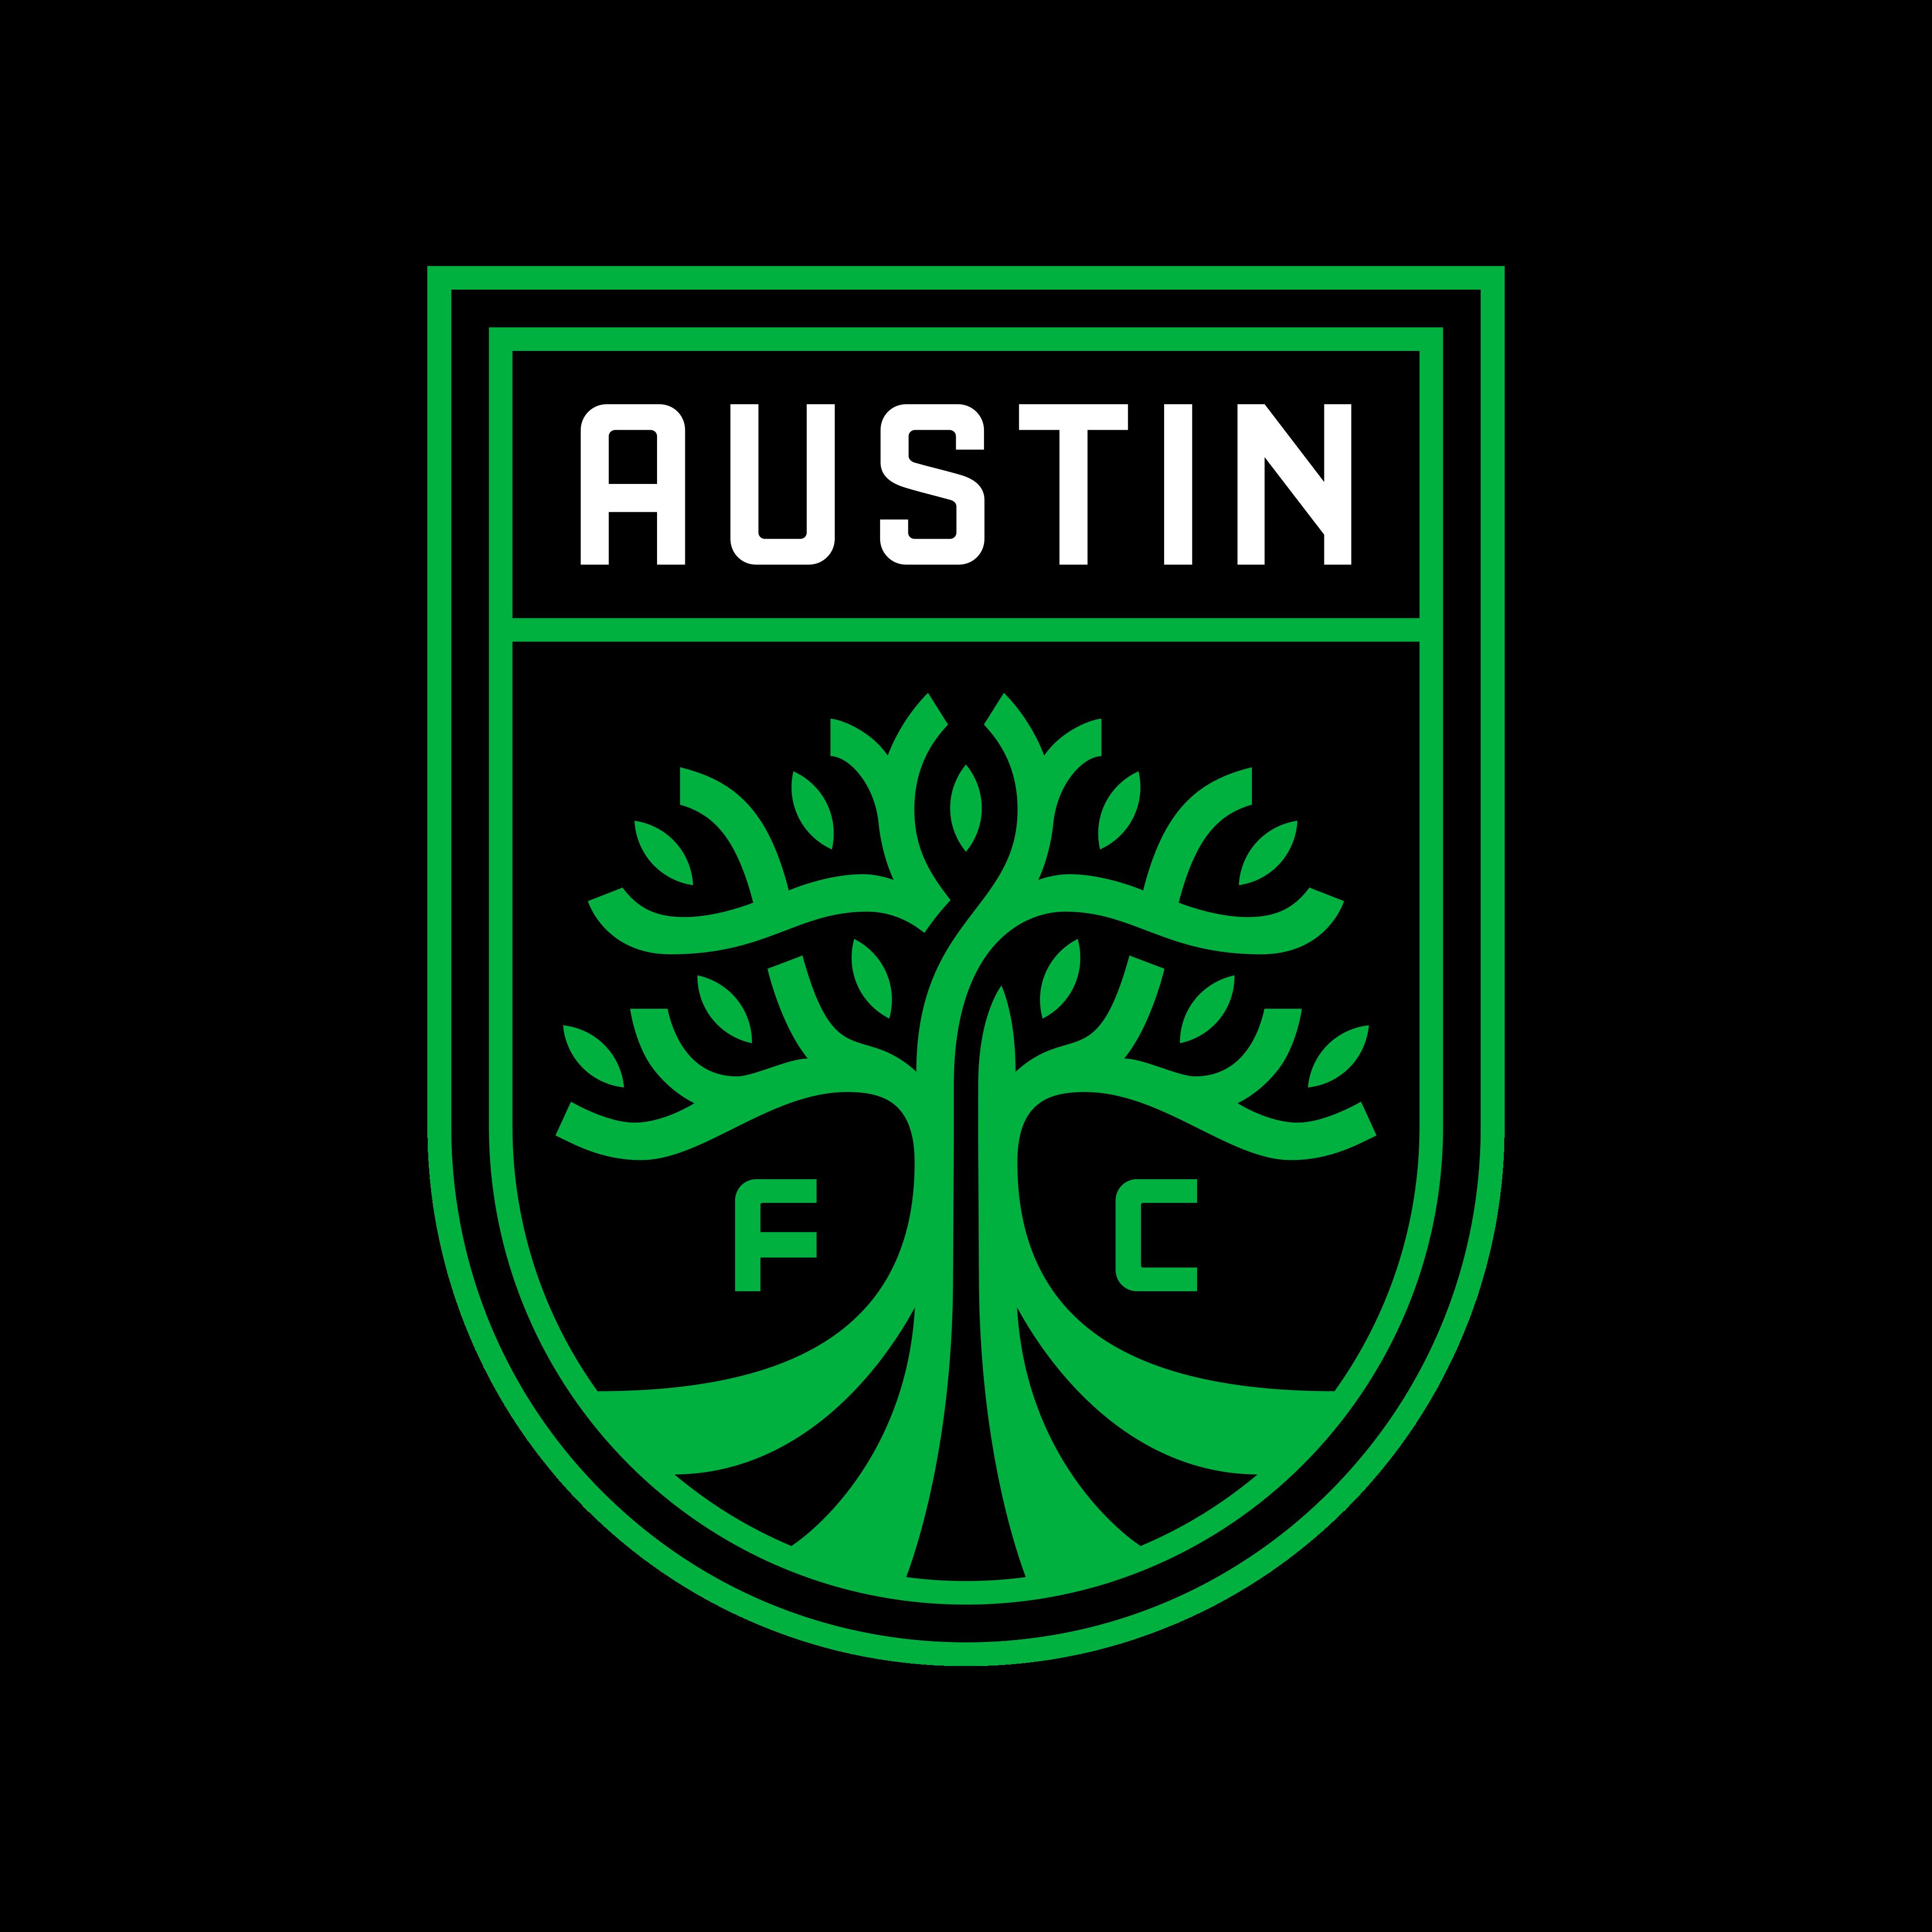 austin fc logo 0 - Austin FC Logo